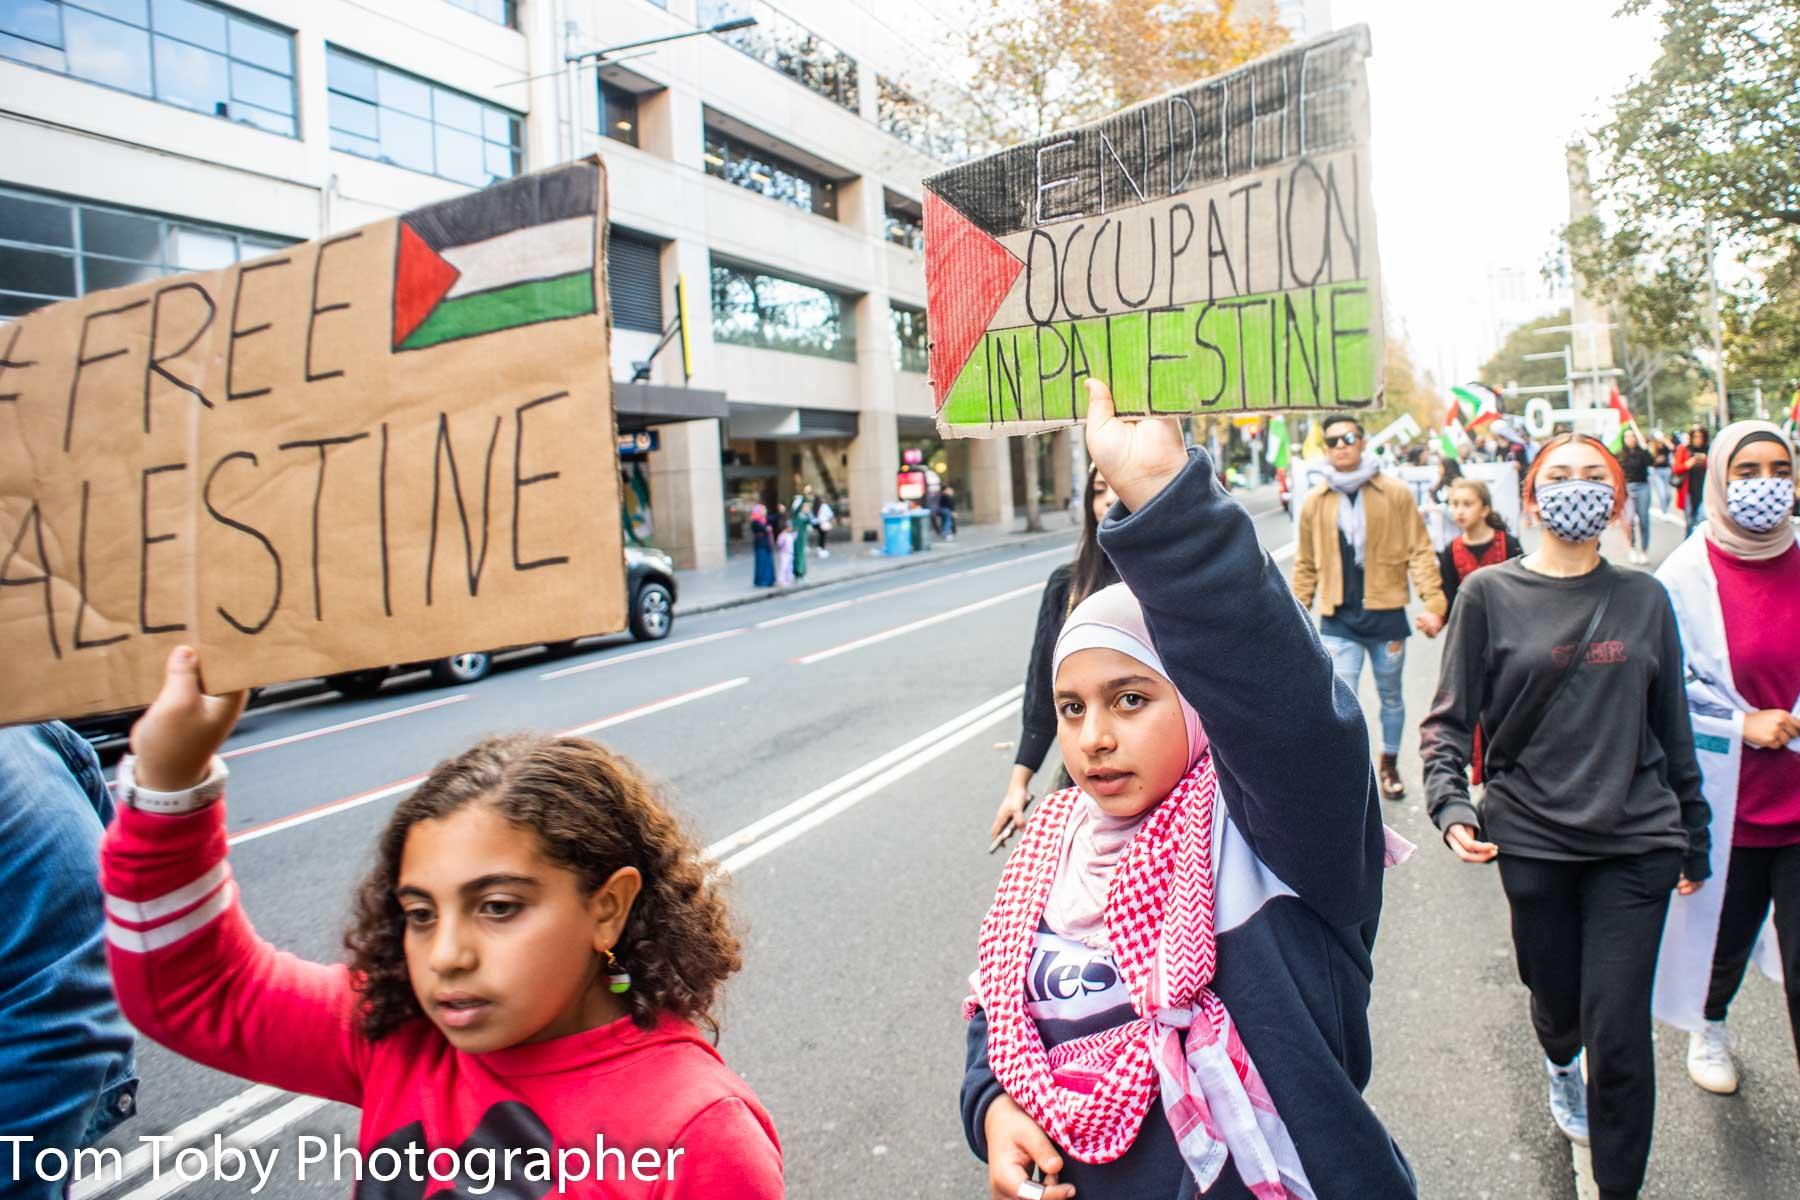 Big girl voice in Sydney for Palestine